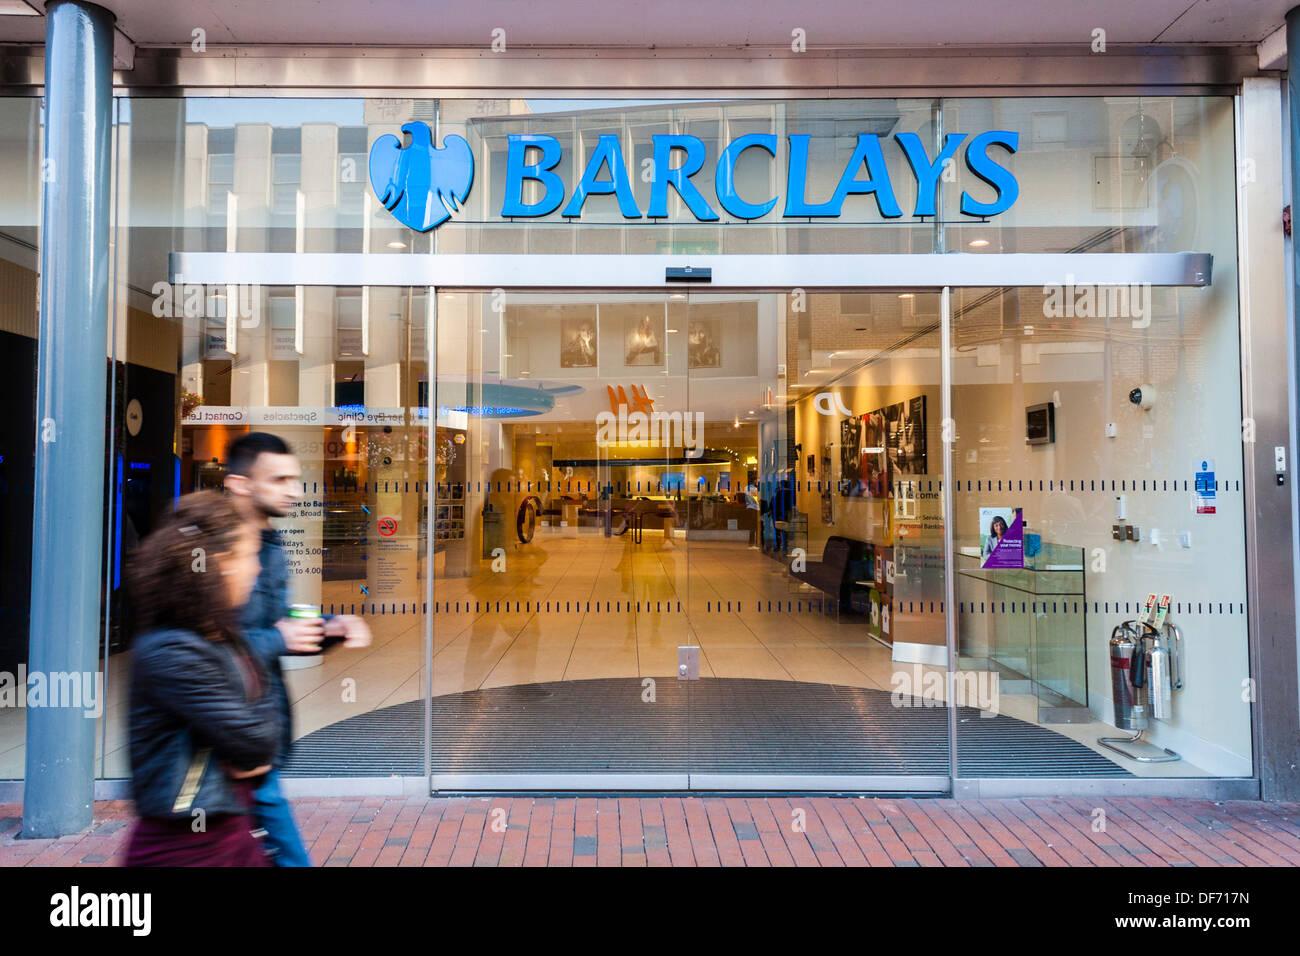 UK high street bank, Barclay's, Reading, Berkshire, England, GB, UK Stock Photo